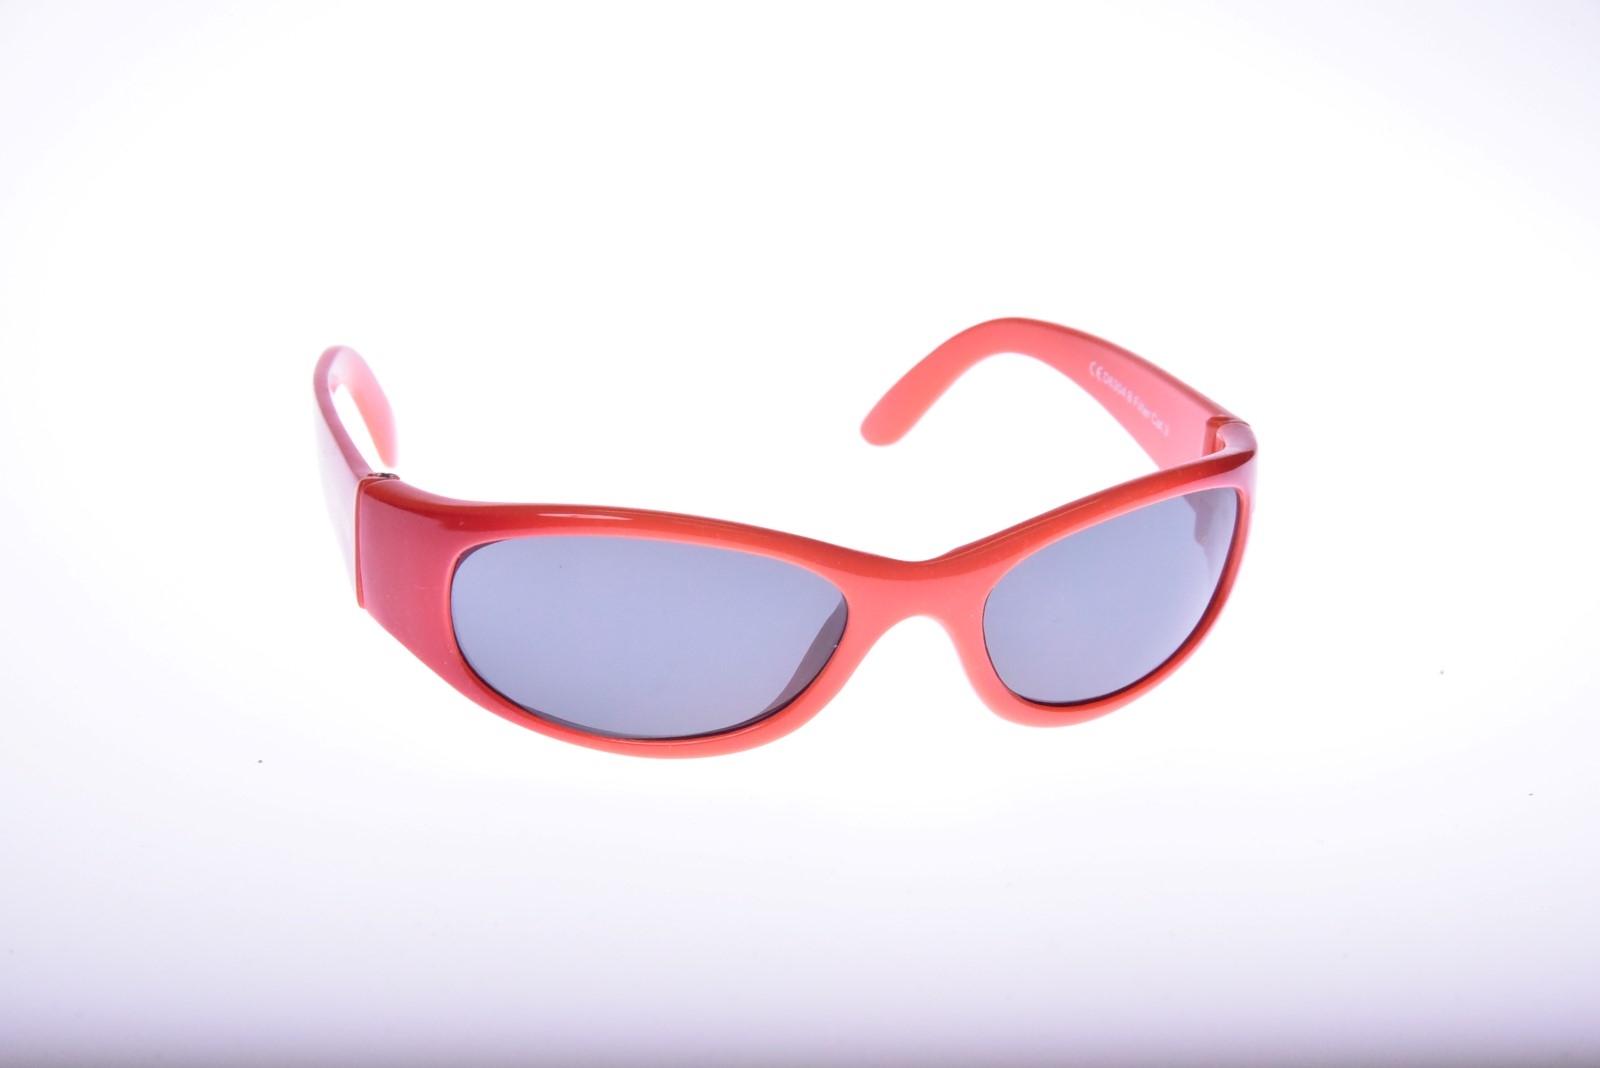 Polaroid Disney D6304B - Slnečné okuliare pre deti 4-7 r.